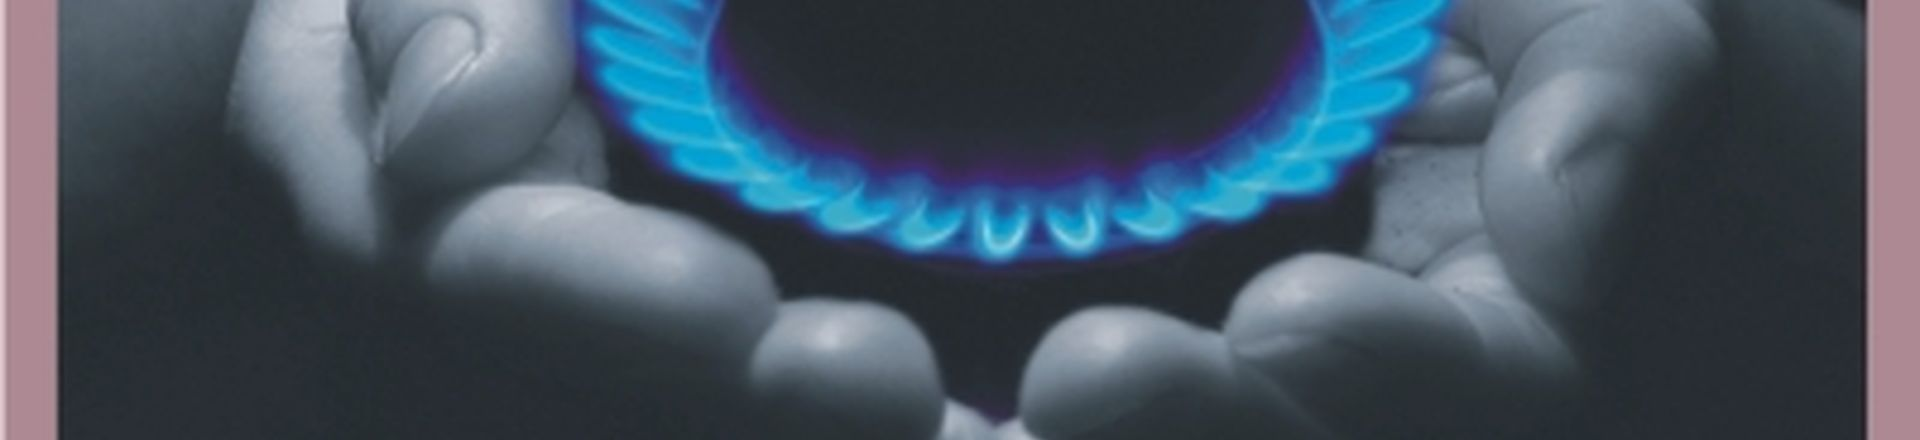 Shale Gas Development